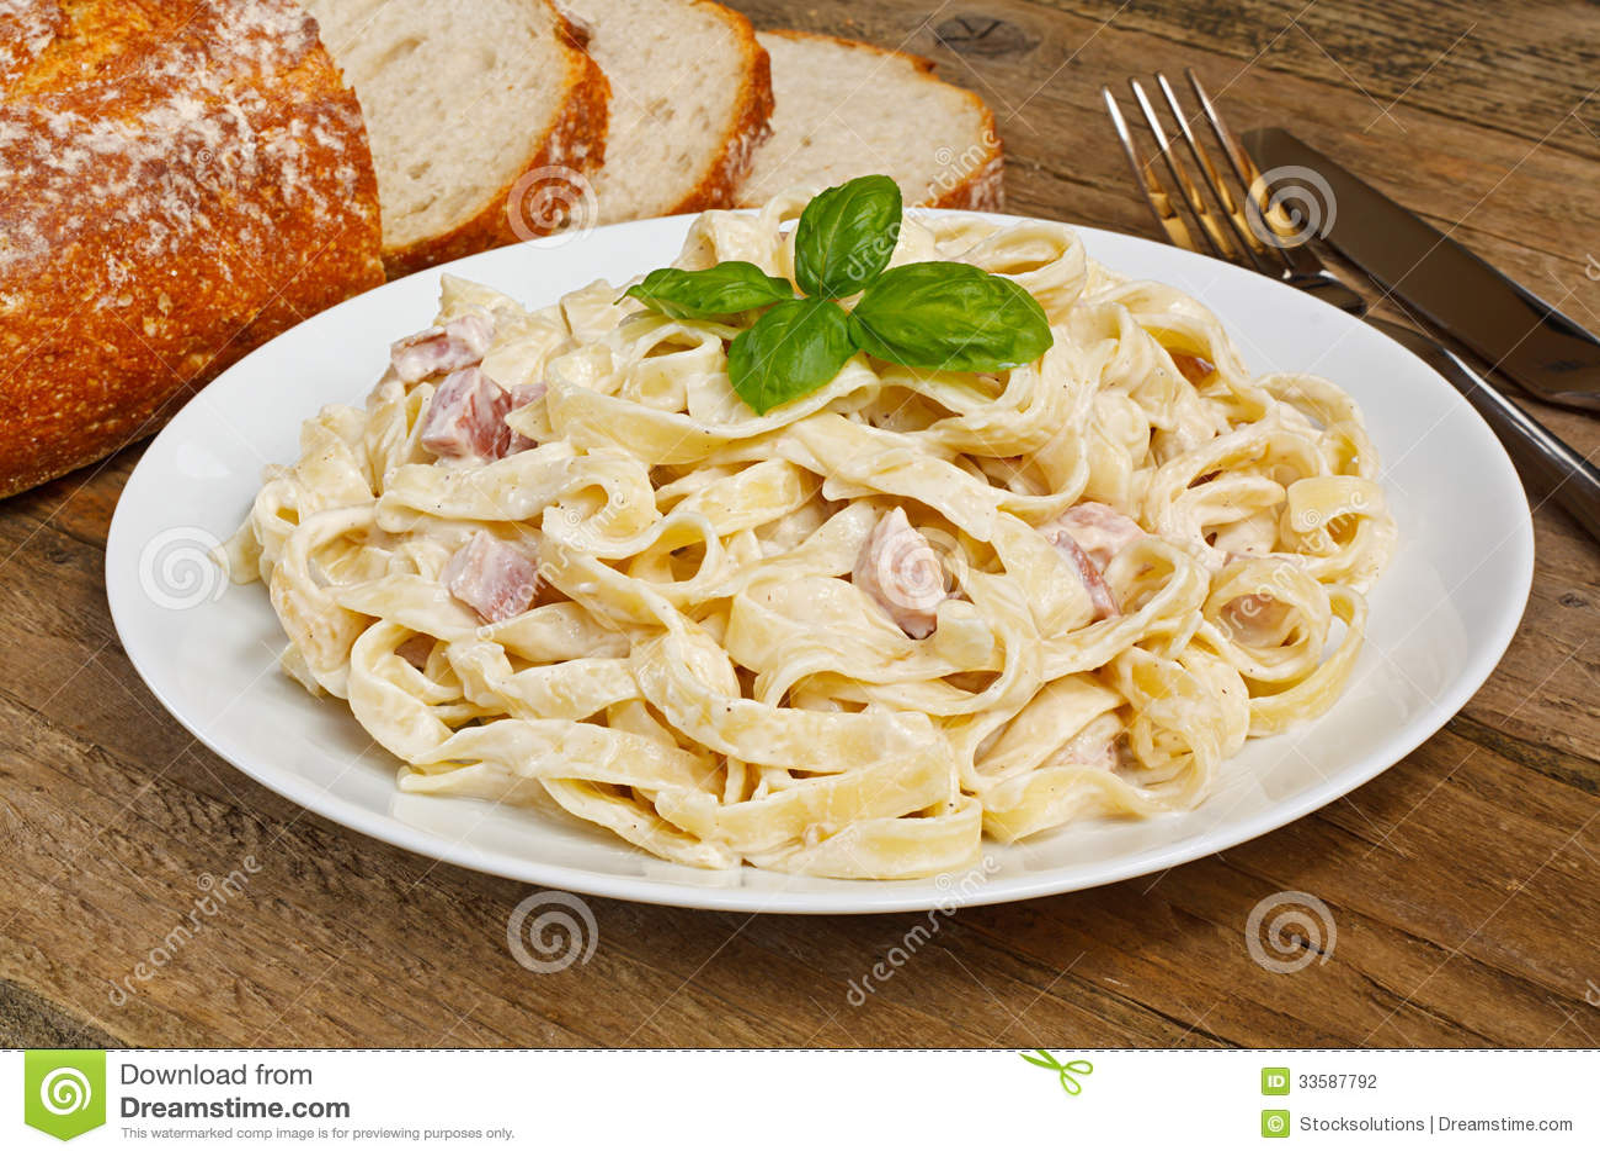 Pasta carbonara stock photo image of bacon gastronomic - Italian cuisine pasta ...